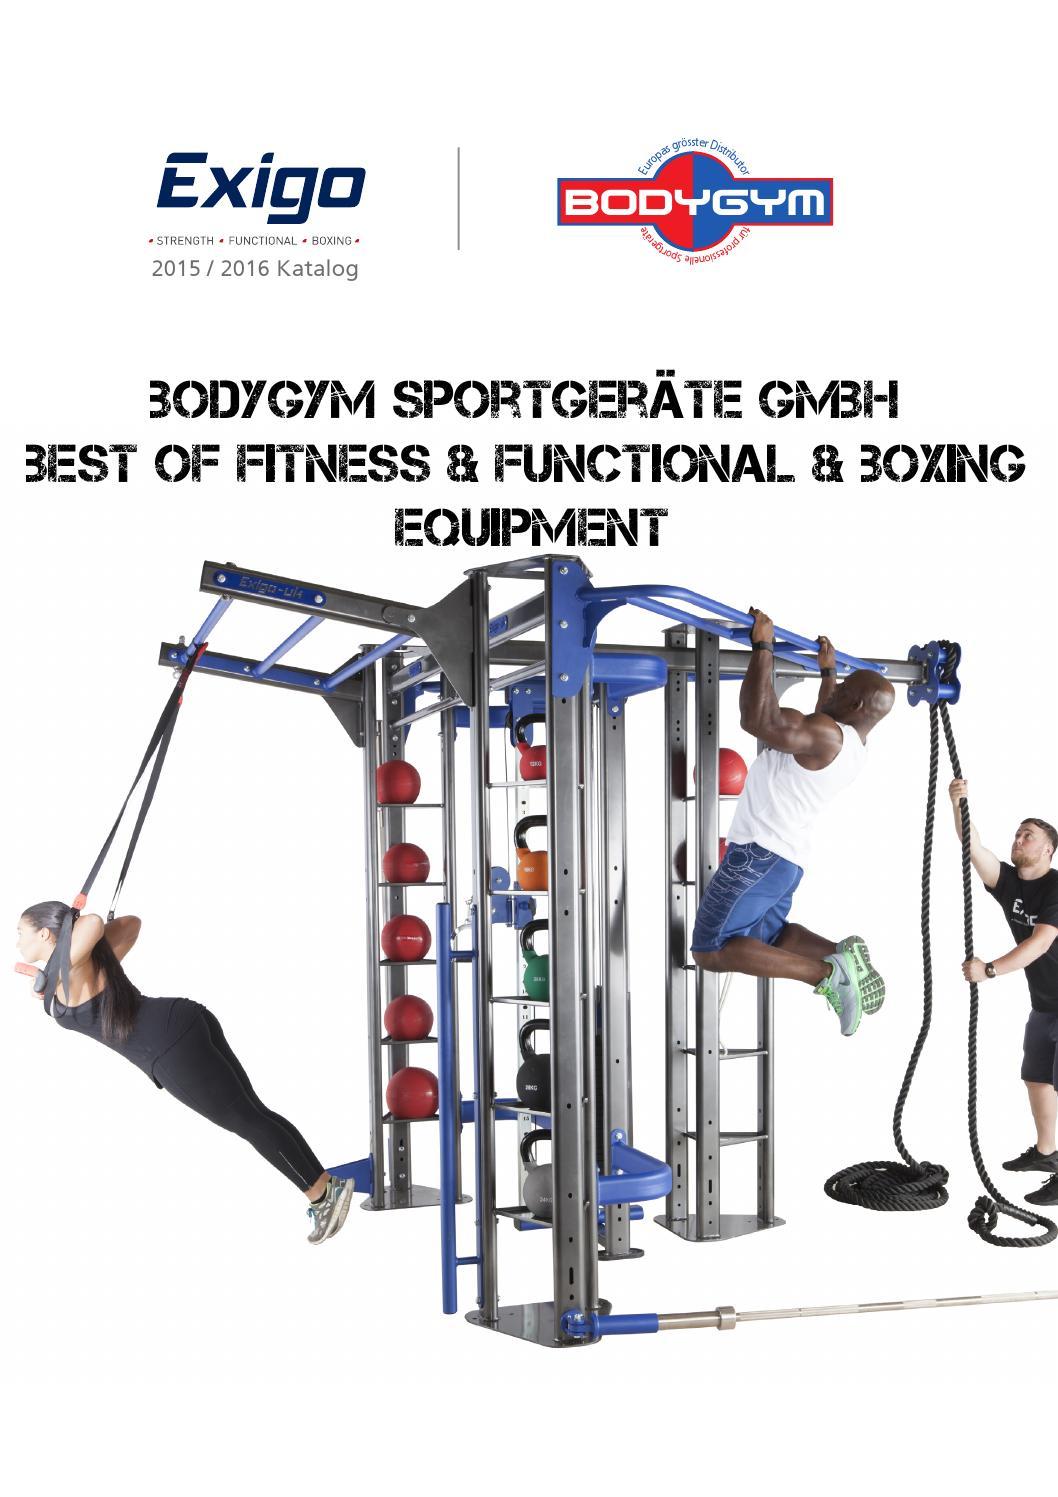 F Sport Ultimate 6/ft /& 5/FT Ziel freistehend Boxsack Heavy Duty Sparring /& MMA Boxen /& Kicking Training